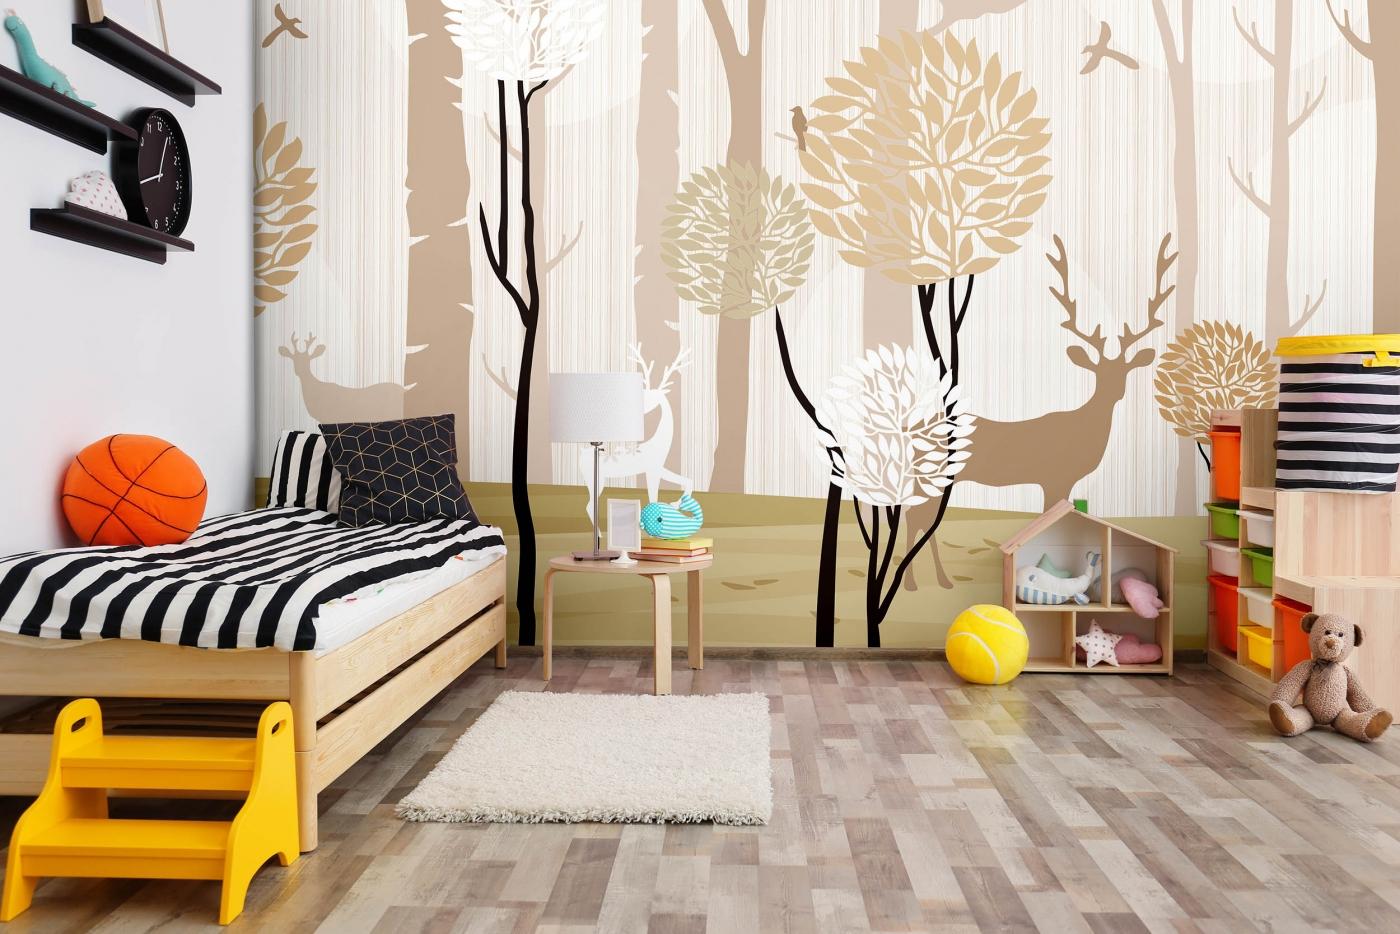 Tapeta Béžový les, 432 x 290 cm